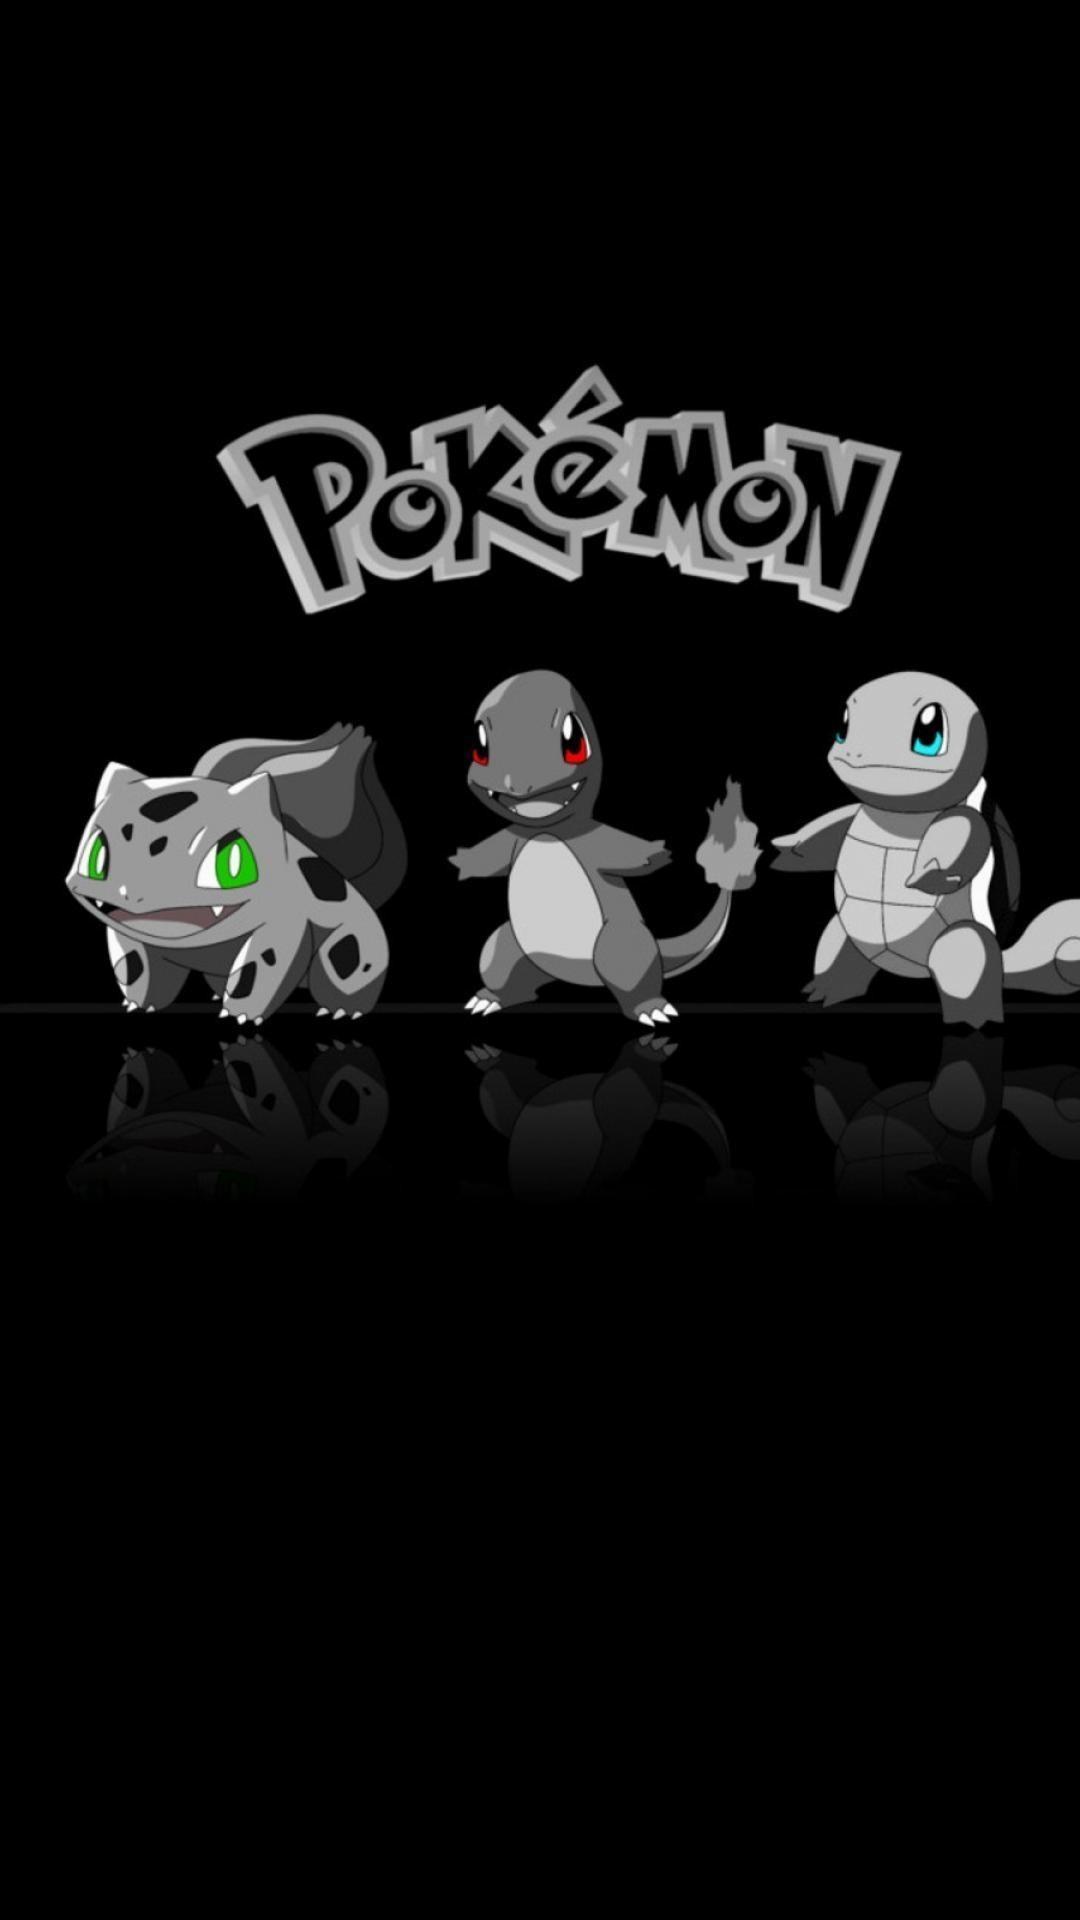 Pokemon-wallpaper-1920×1080-black-and-white-iphone-6-